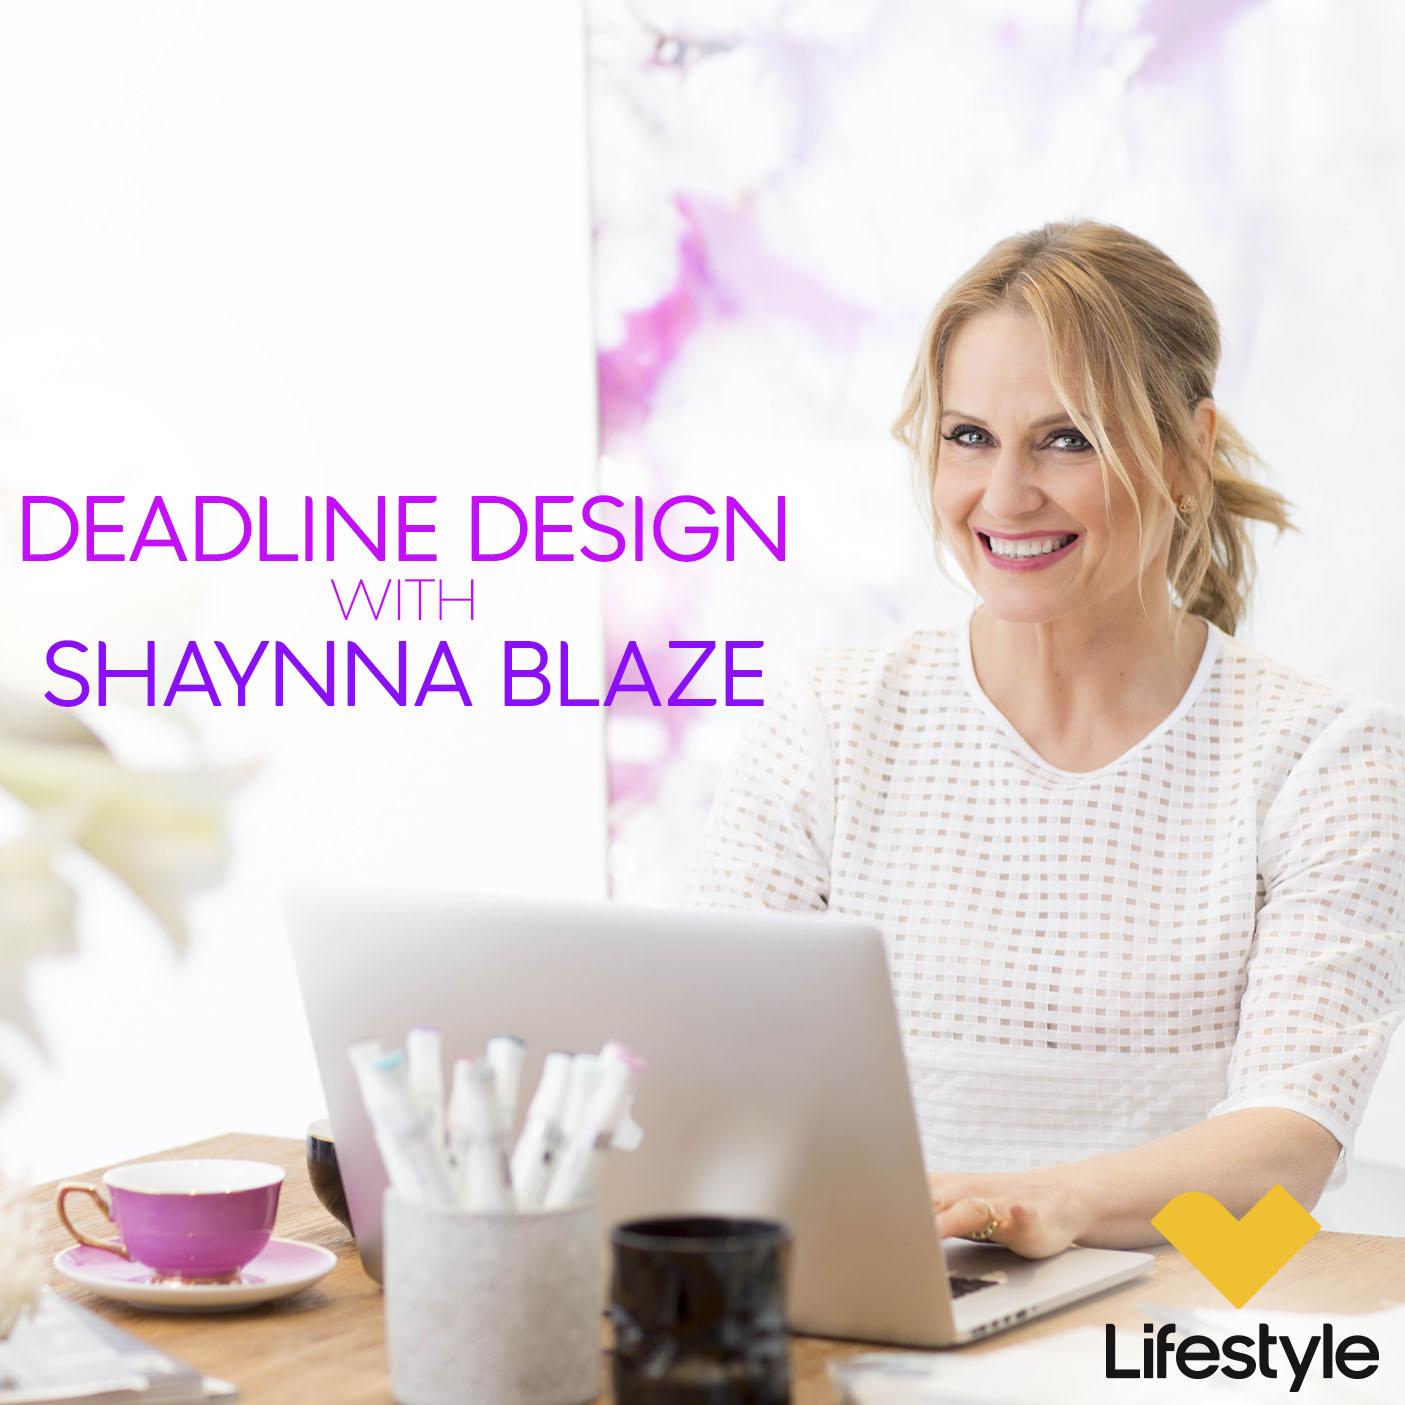 interior design guru shaynna blaze - deadline design